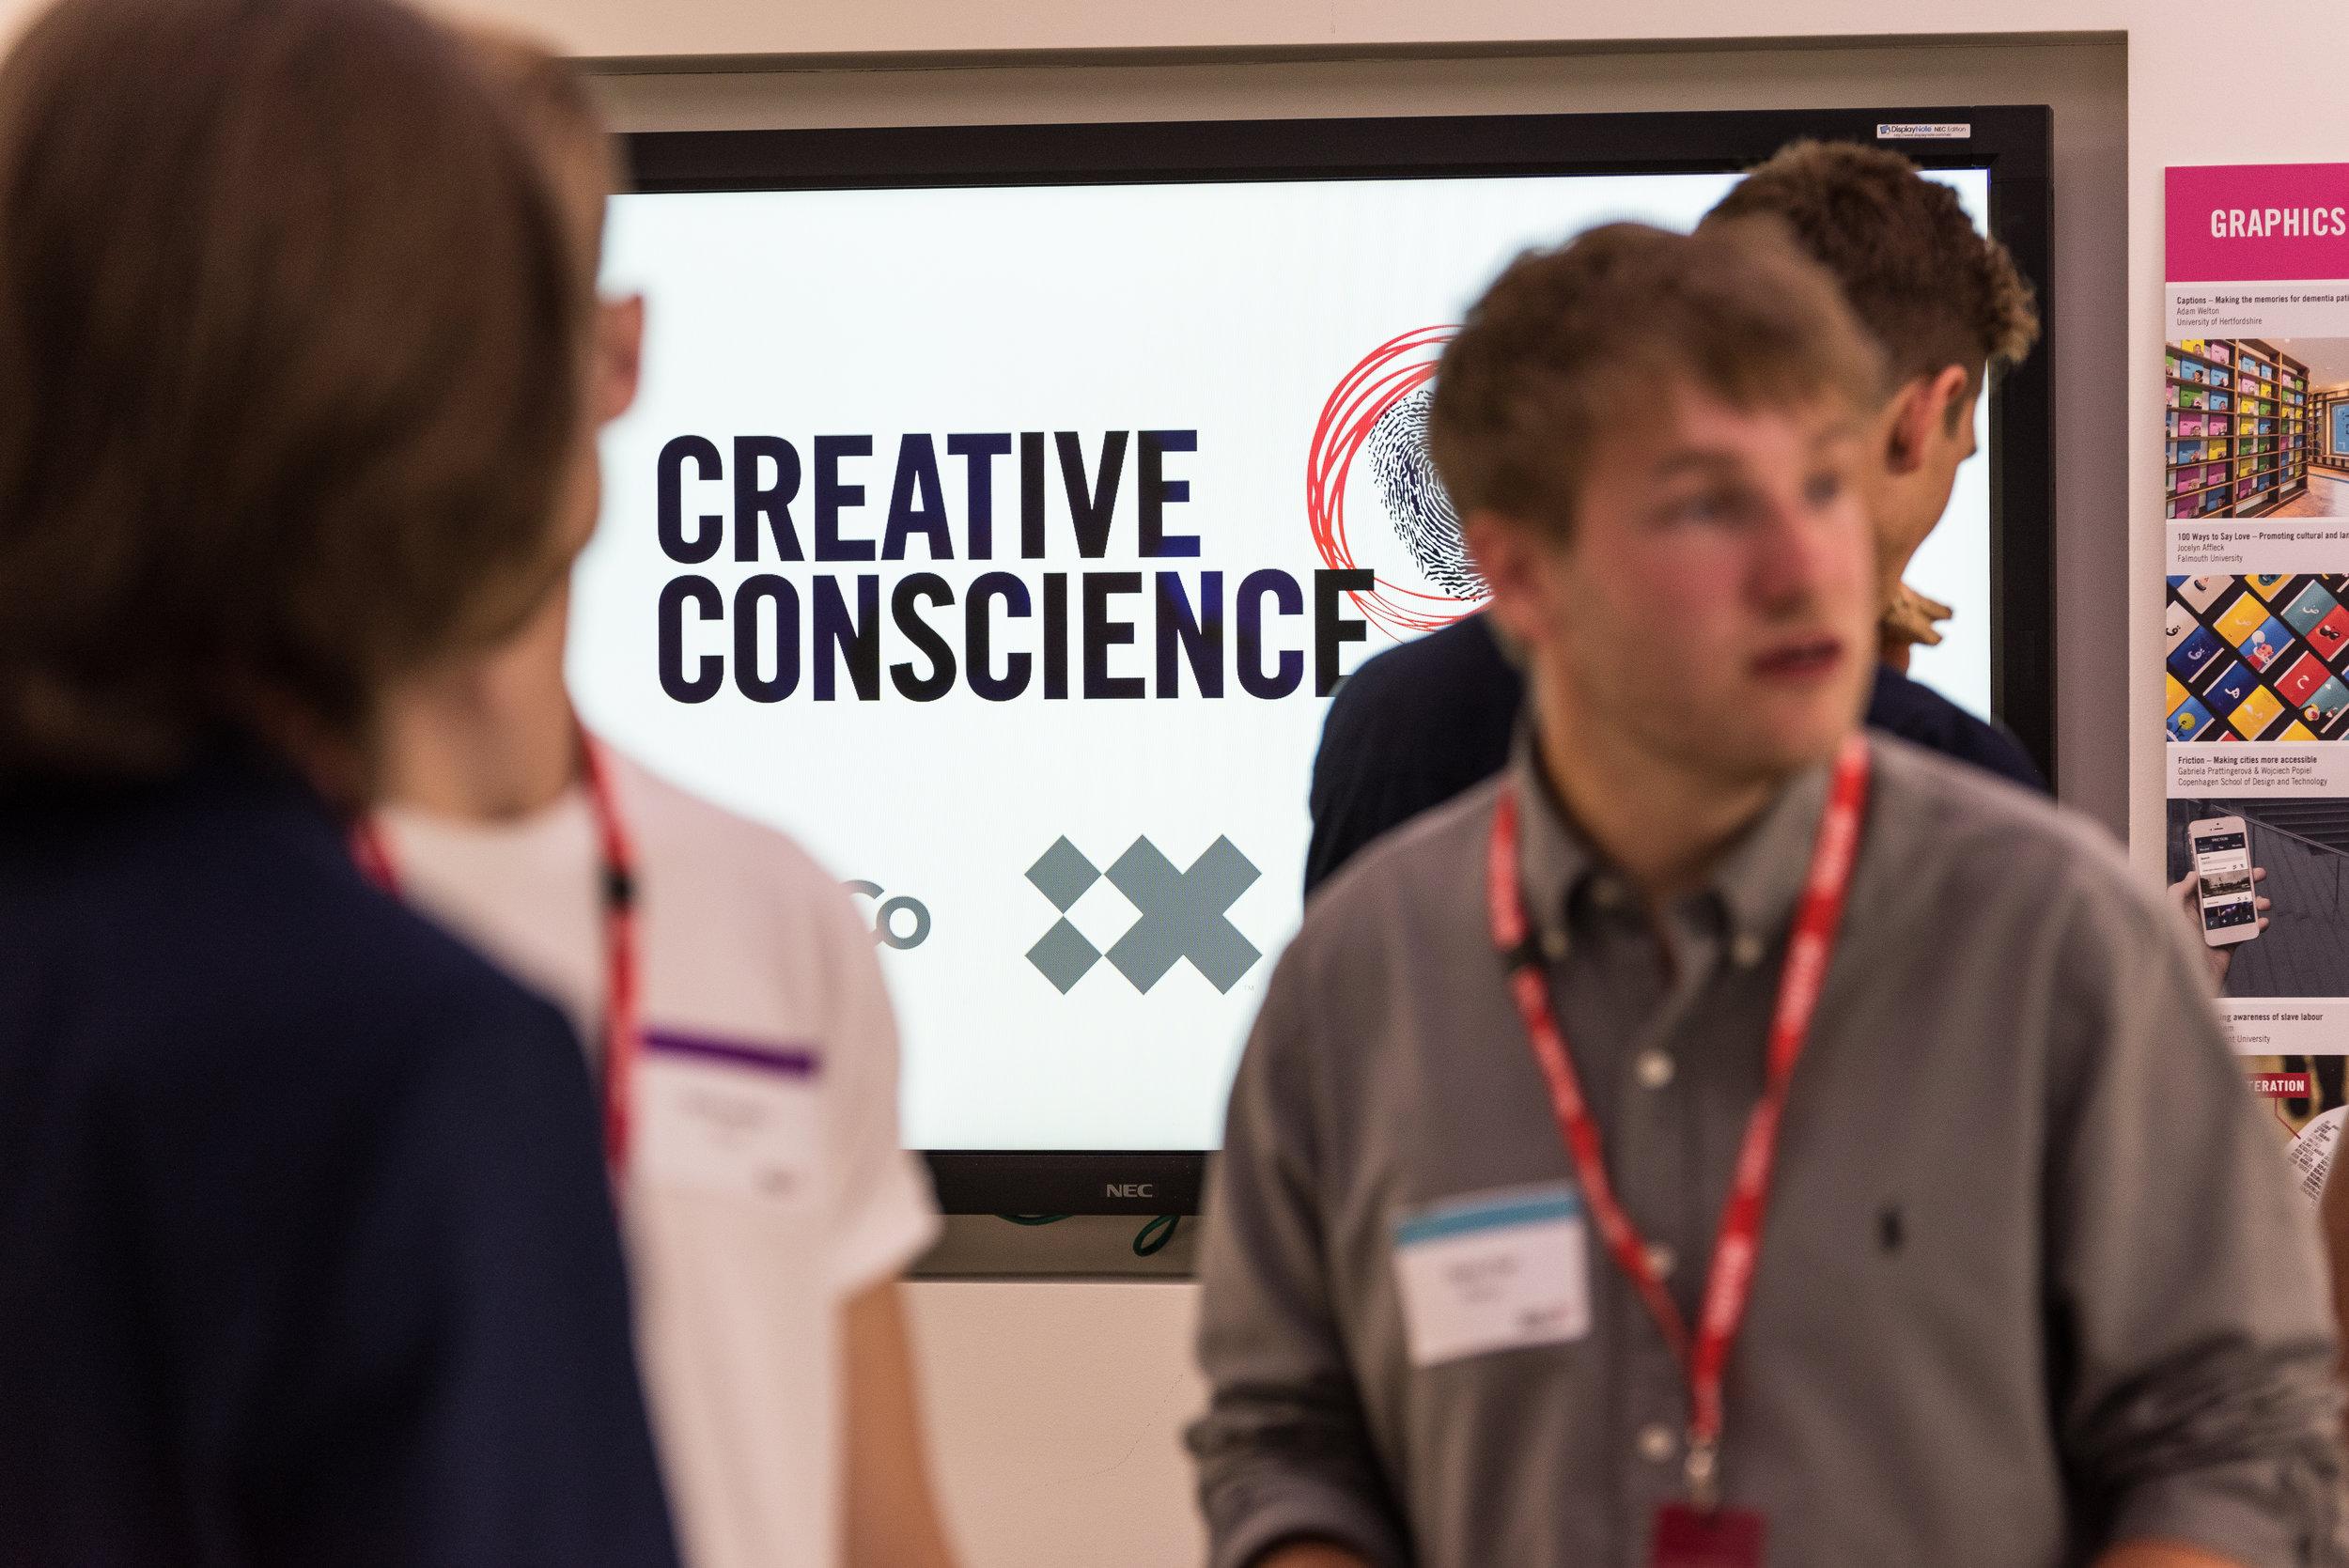 Creative Conscience Awards 2018 Photography Tunbridge Studio Portrait Photographer 030718-38.jpg